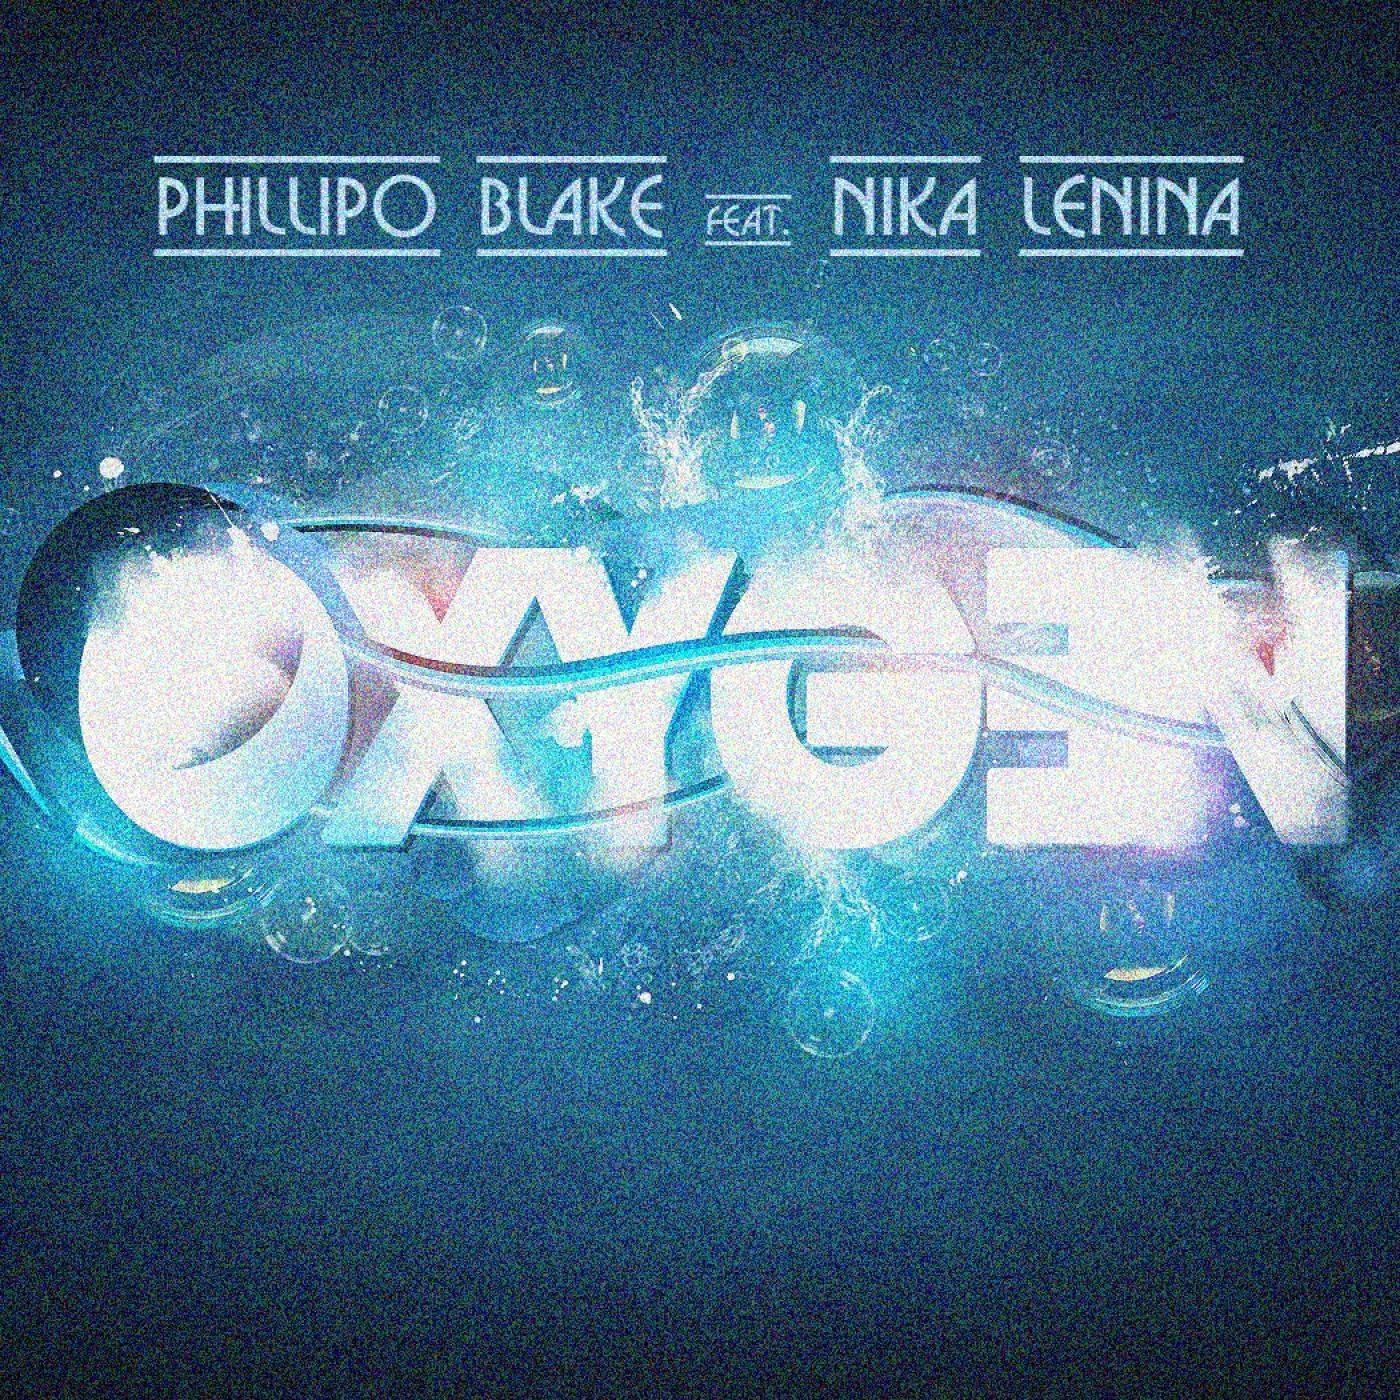 Phillipo Blake Feat. Nika Lenina - Oxygen (Original Mix)